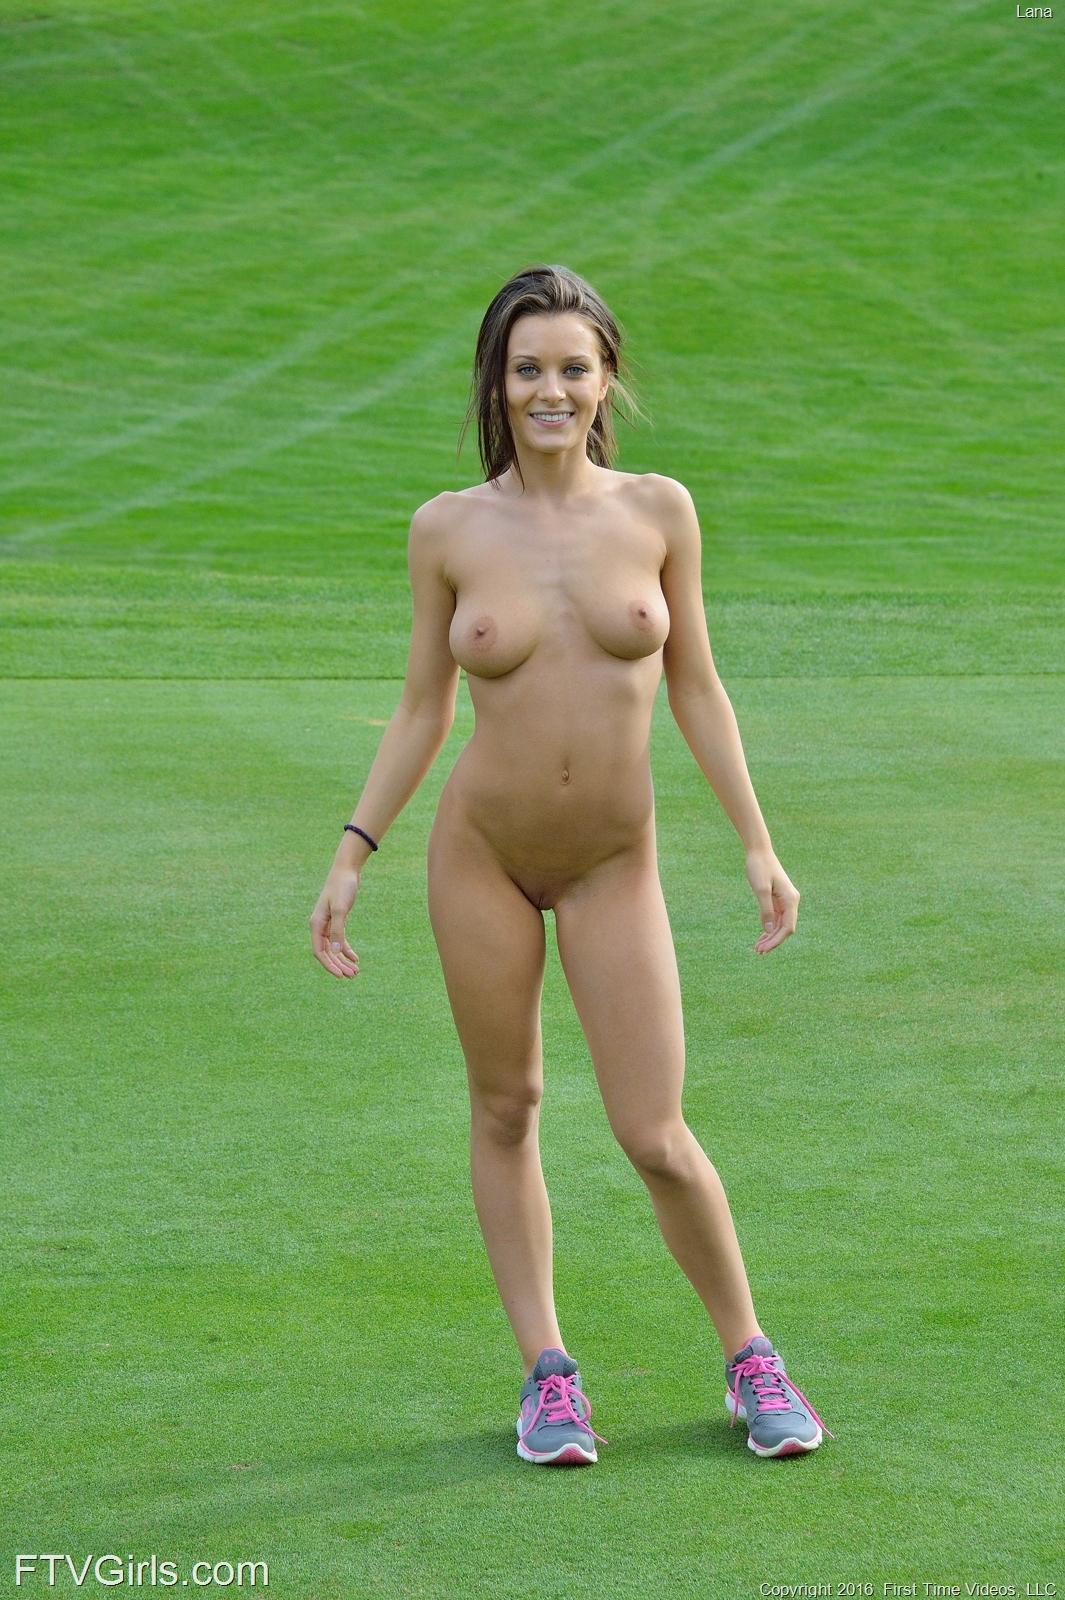 Lana golf course flash in public ftvgirls 26 RedBust